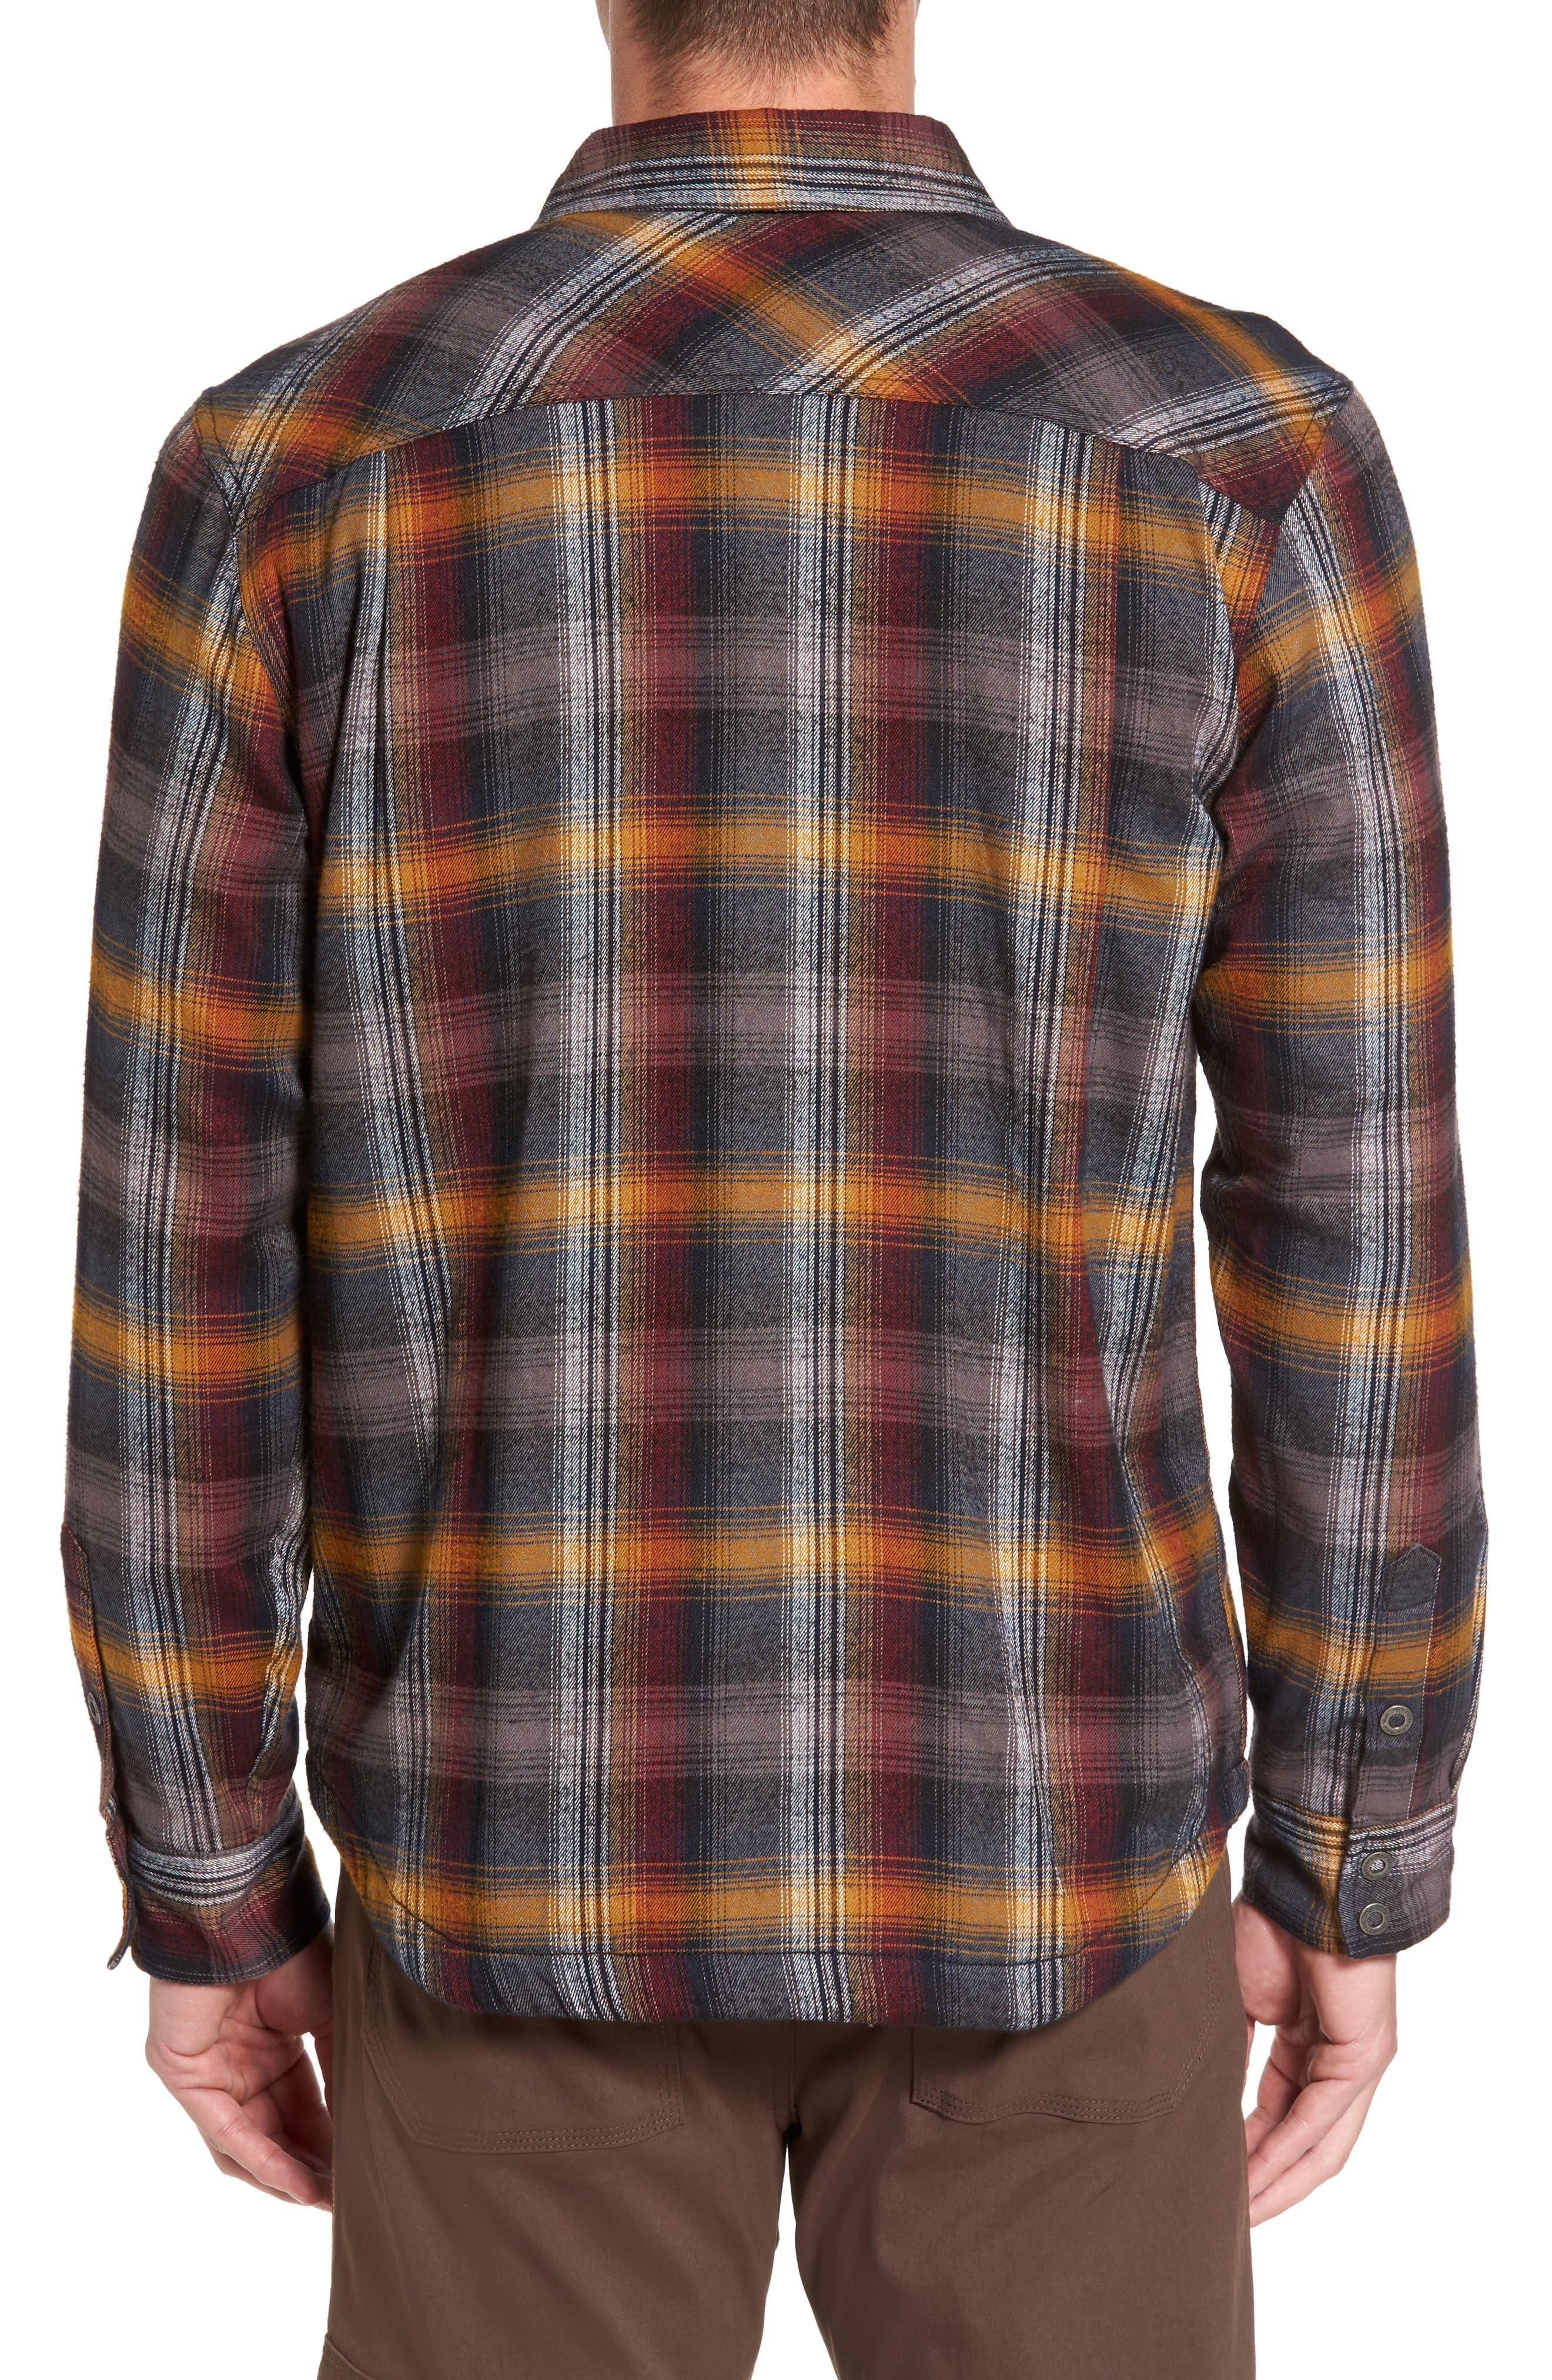 Asylum Regular Fit Plaid Shirt Jacket,                             Alternate thumbnail 2, color,                             001